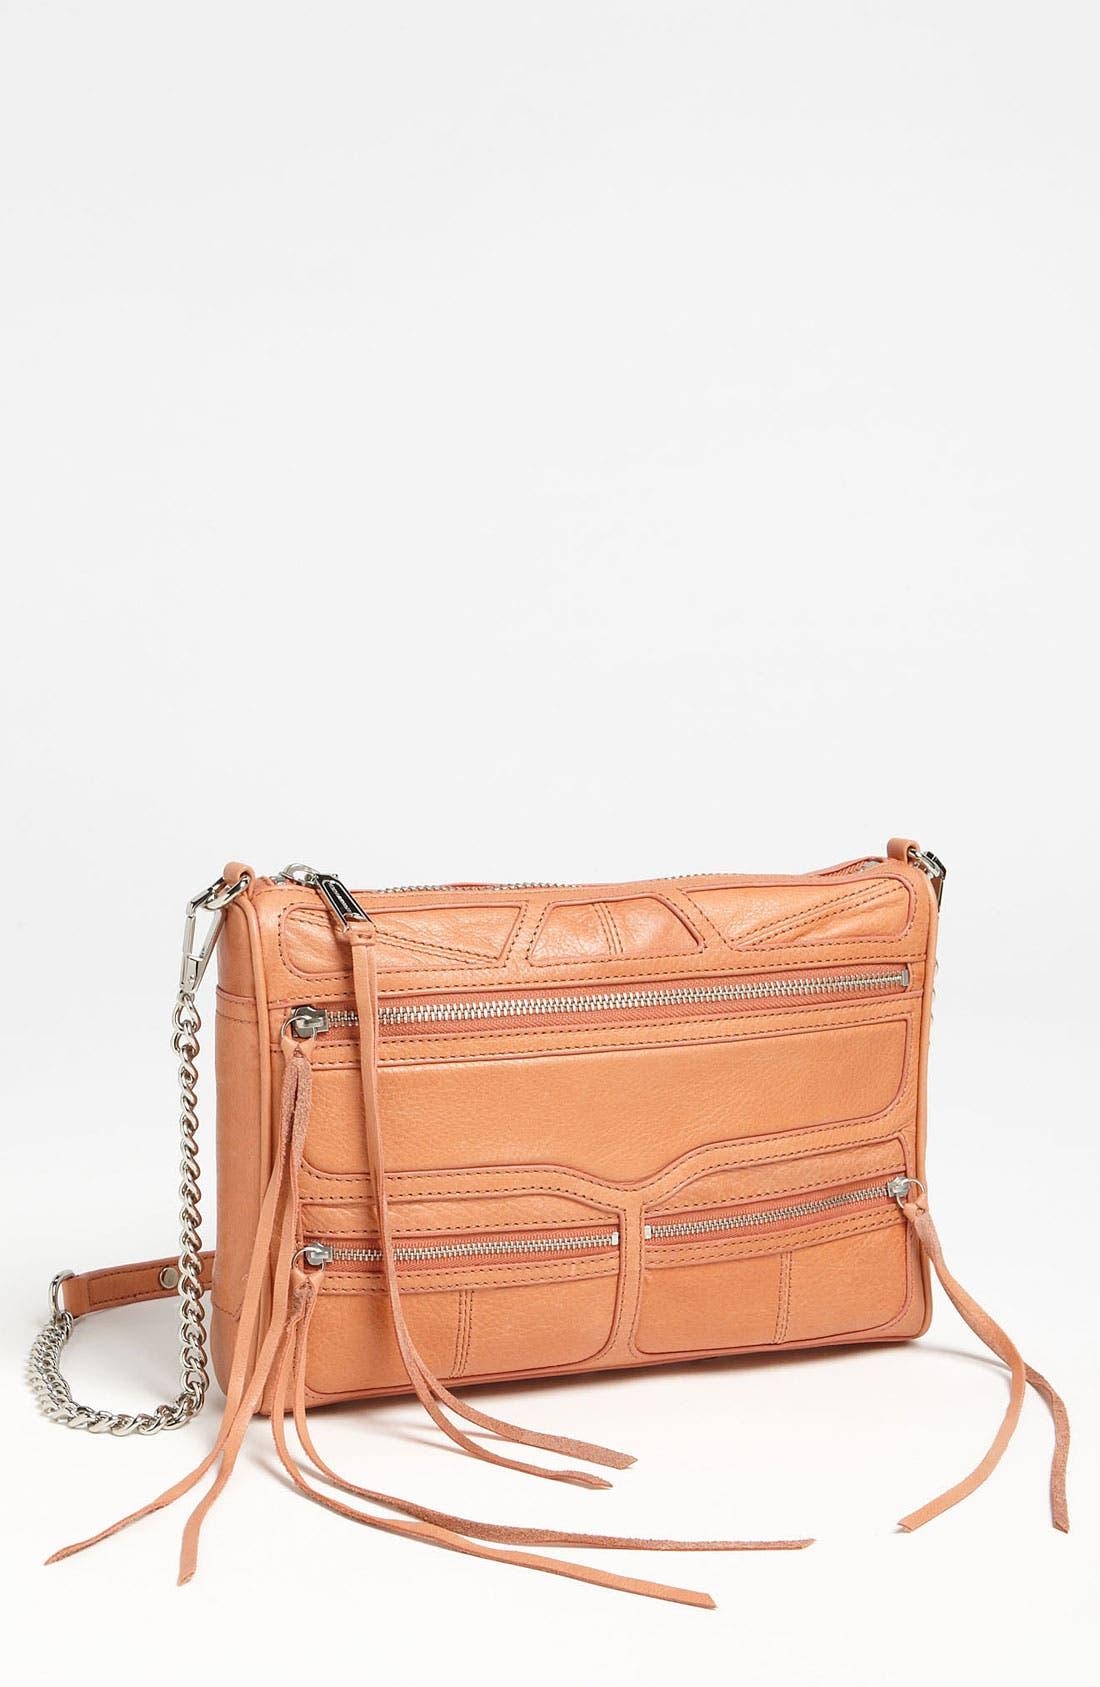 Main Image - Rebecca Minkoff '3 Zip MAC' Shoulder Bag